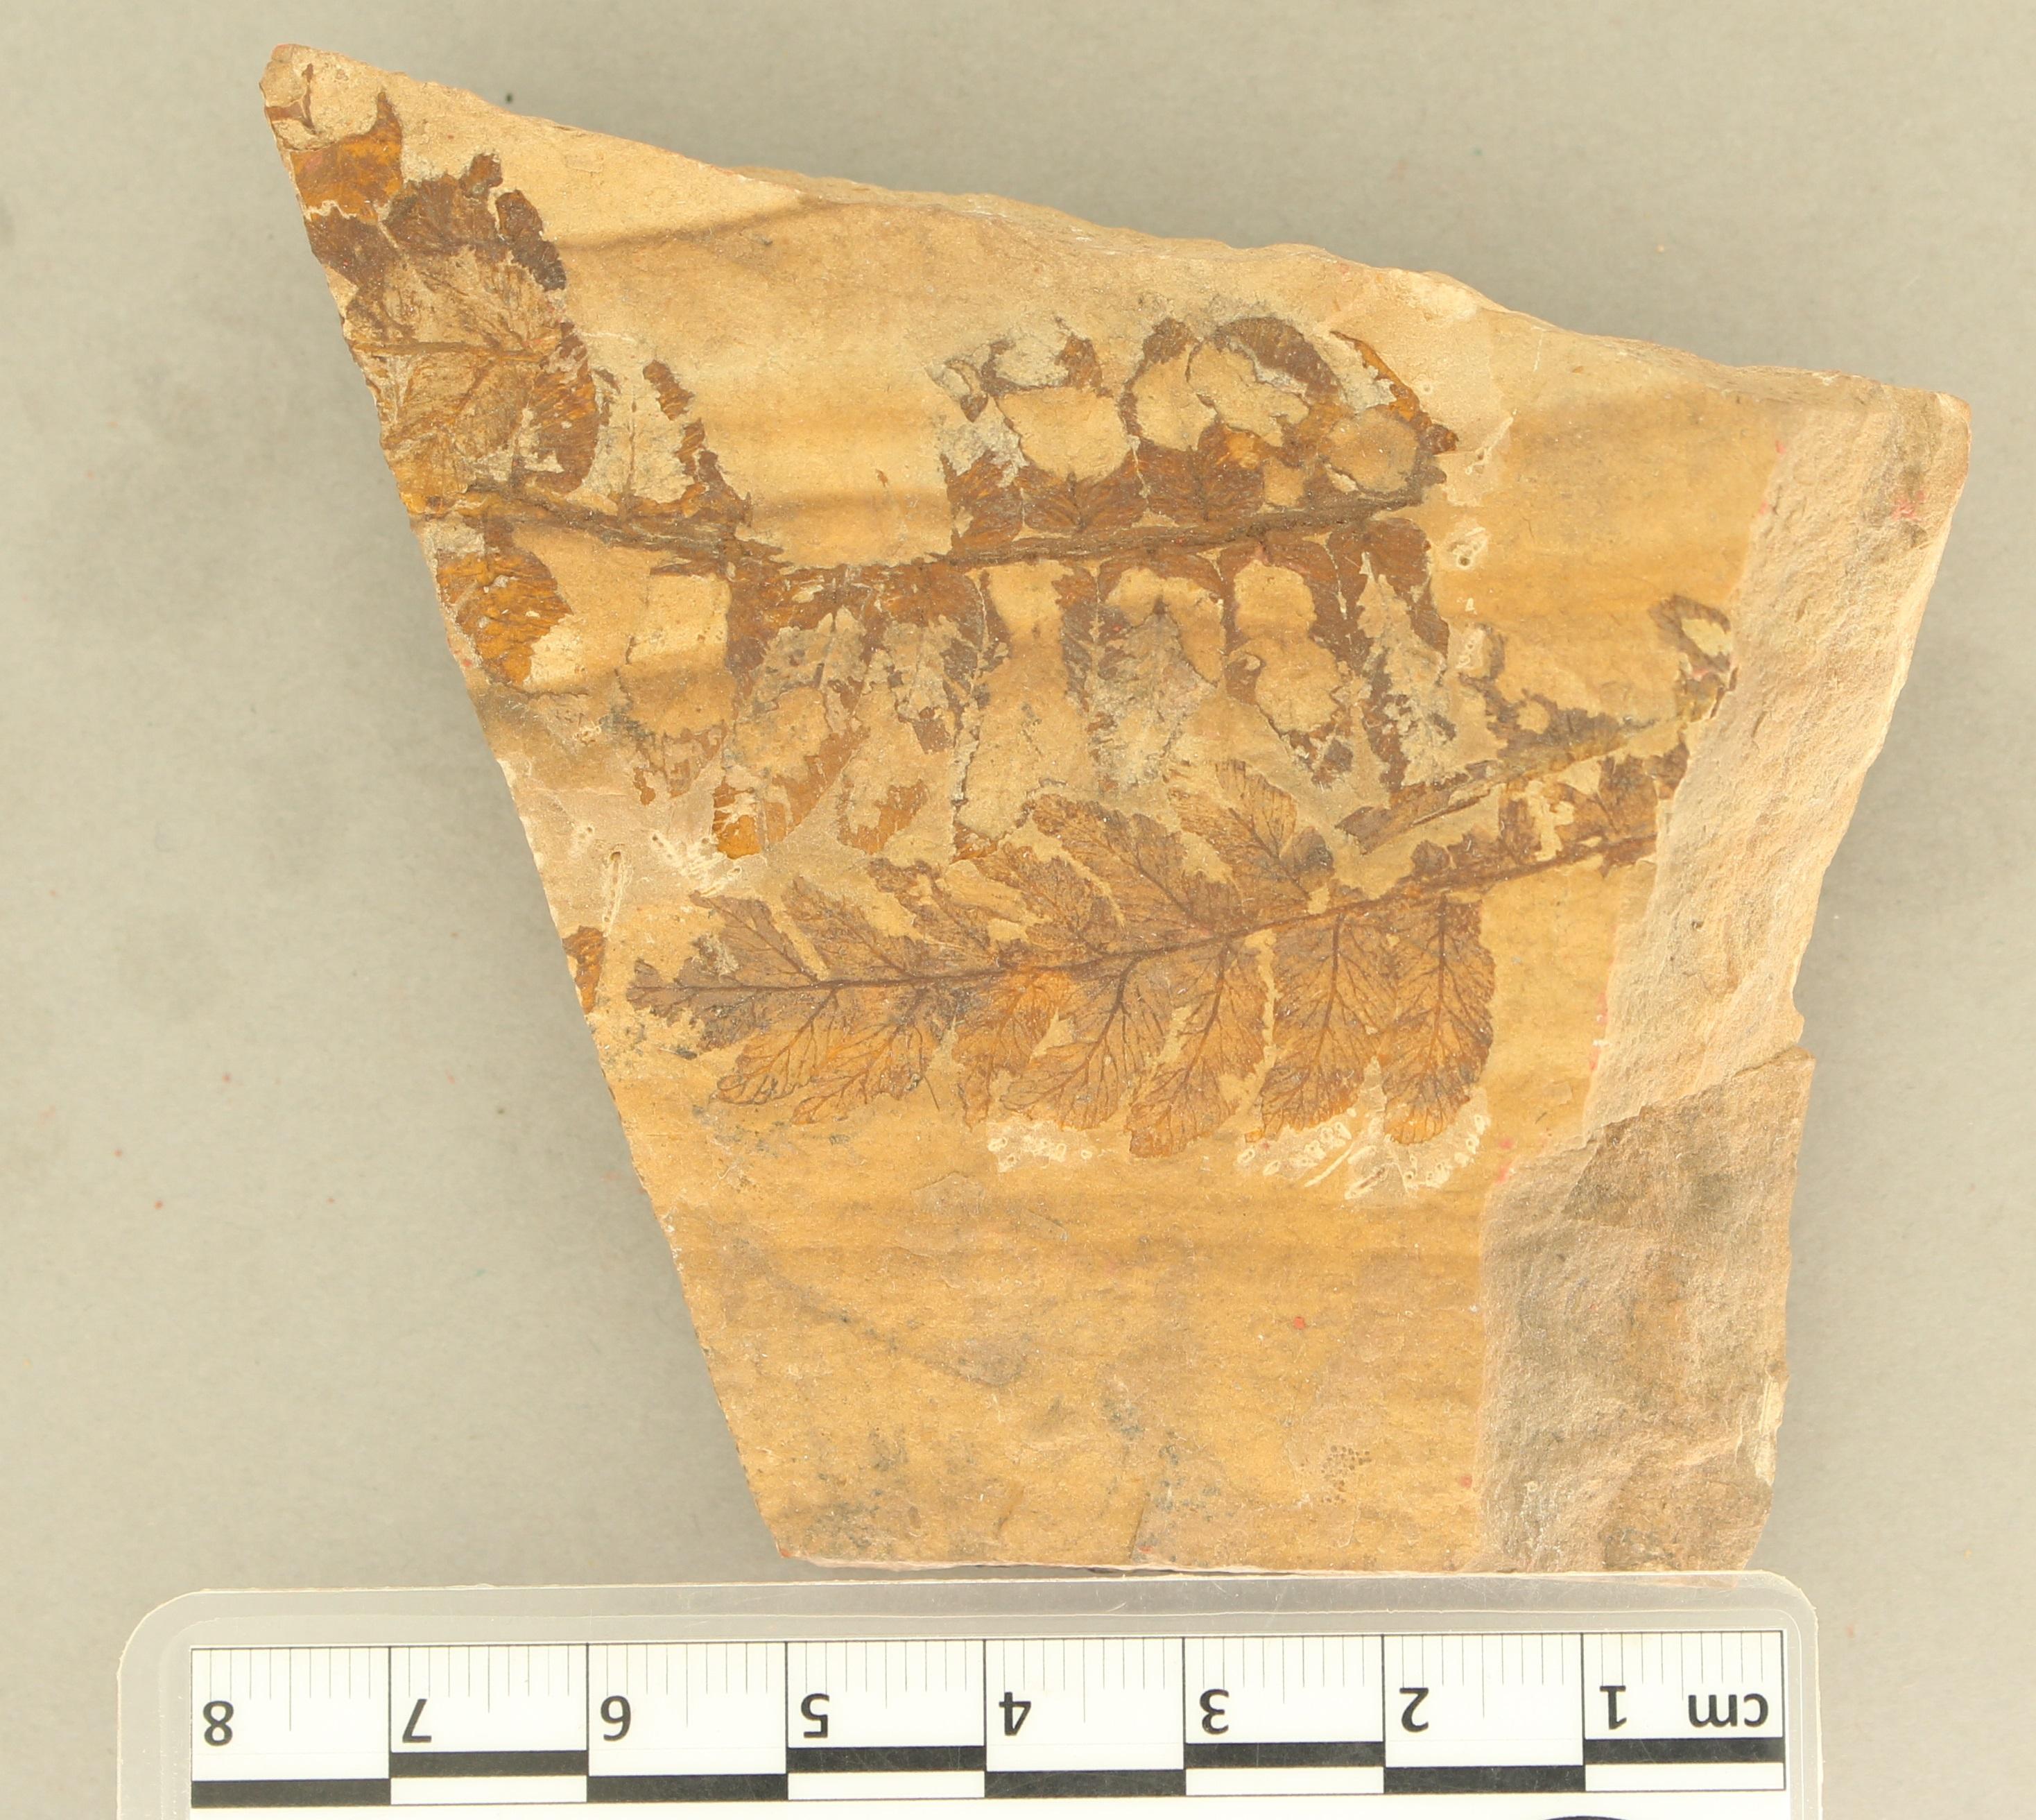 IRSNB b 8685 - Detail